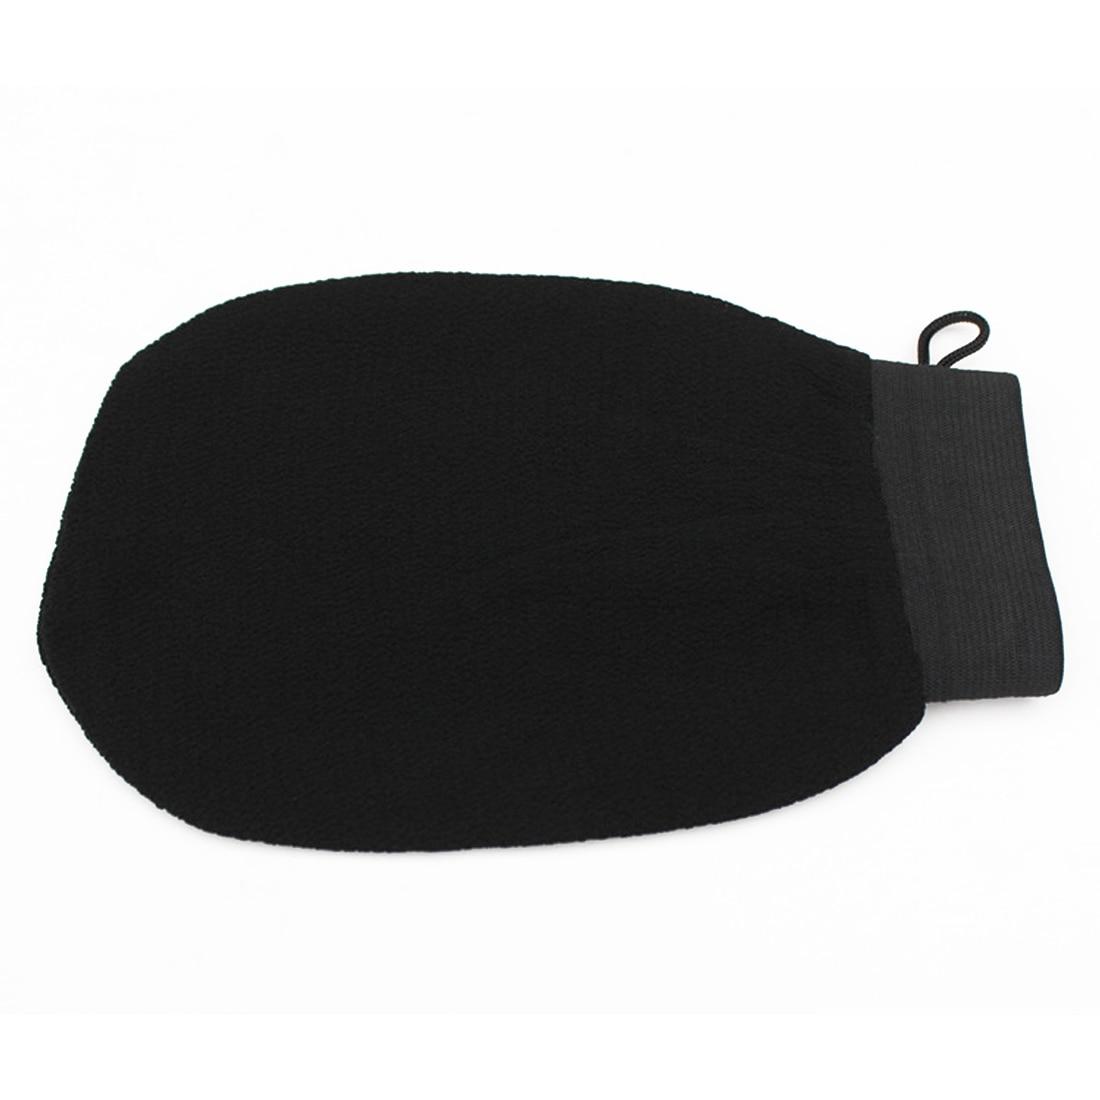 Top Quality 1 PC Magic Black Exfoliator Bath Glove Body Cleaning Scrub Mitt Rub Dead Skin Removal Shower Spa Massage